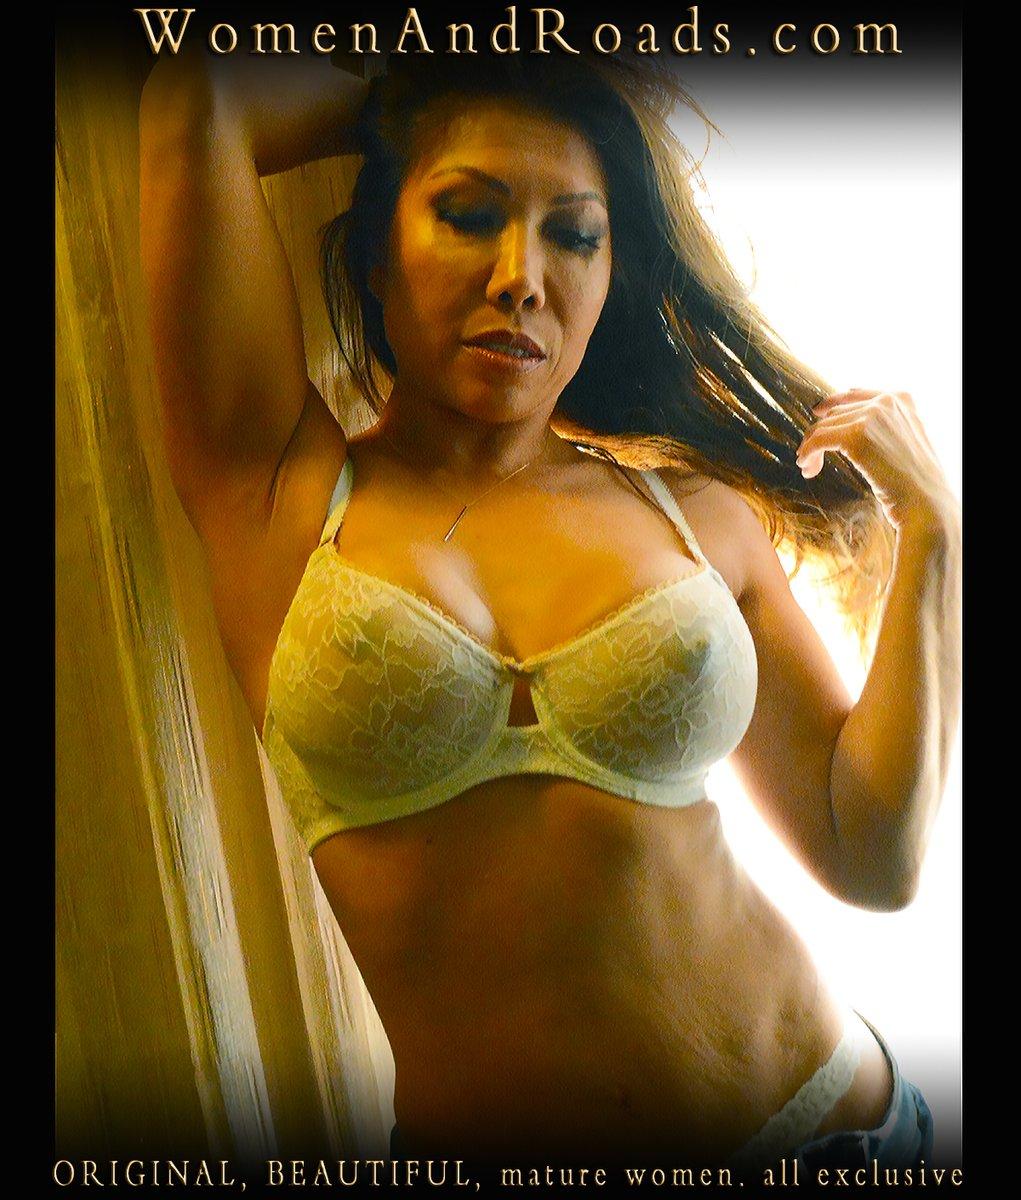 find here: https://womenandroads.com/downloads/w69/ - - - #Sexytanktop #Sexymaturewomen #Maturemodel #Sexyasian #Beautifulwoman #Seductionpic.twitter.com/PJNINPxFv6